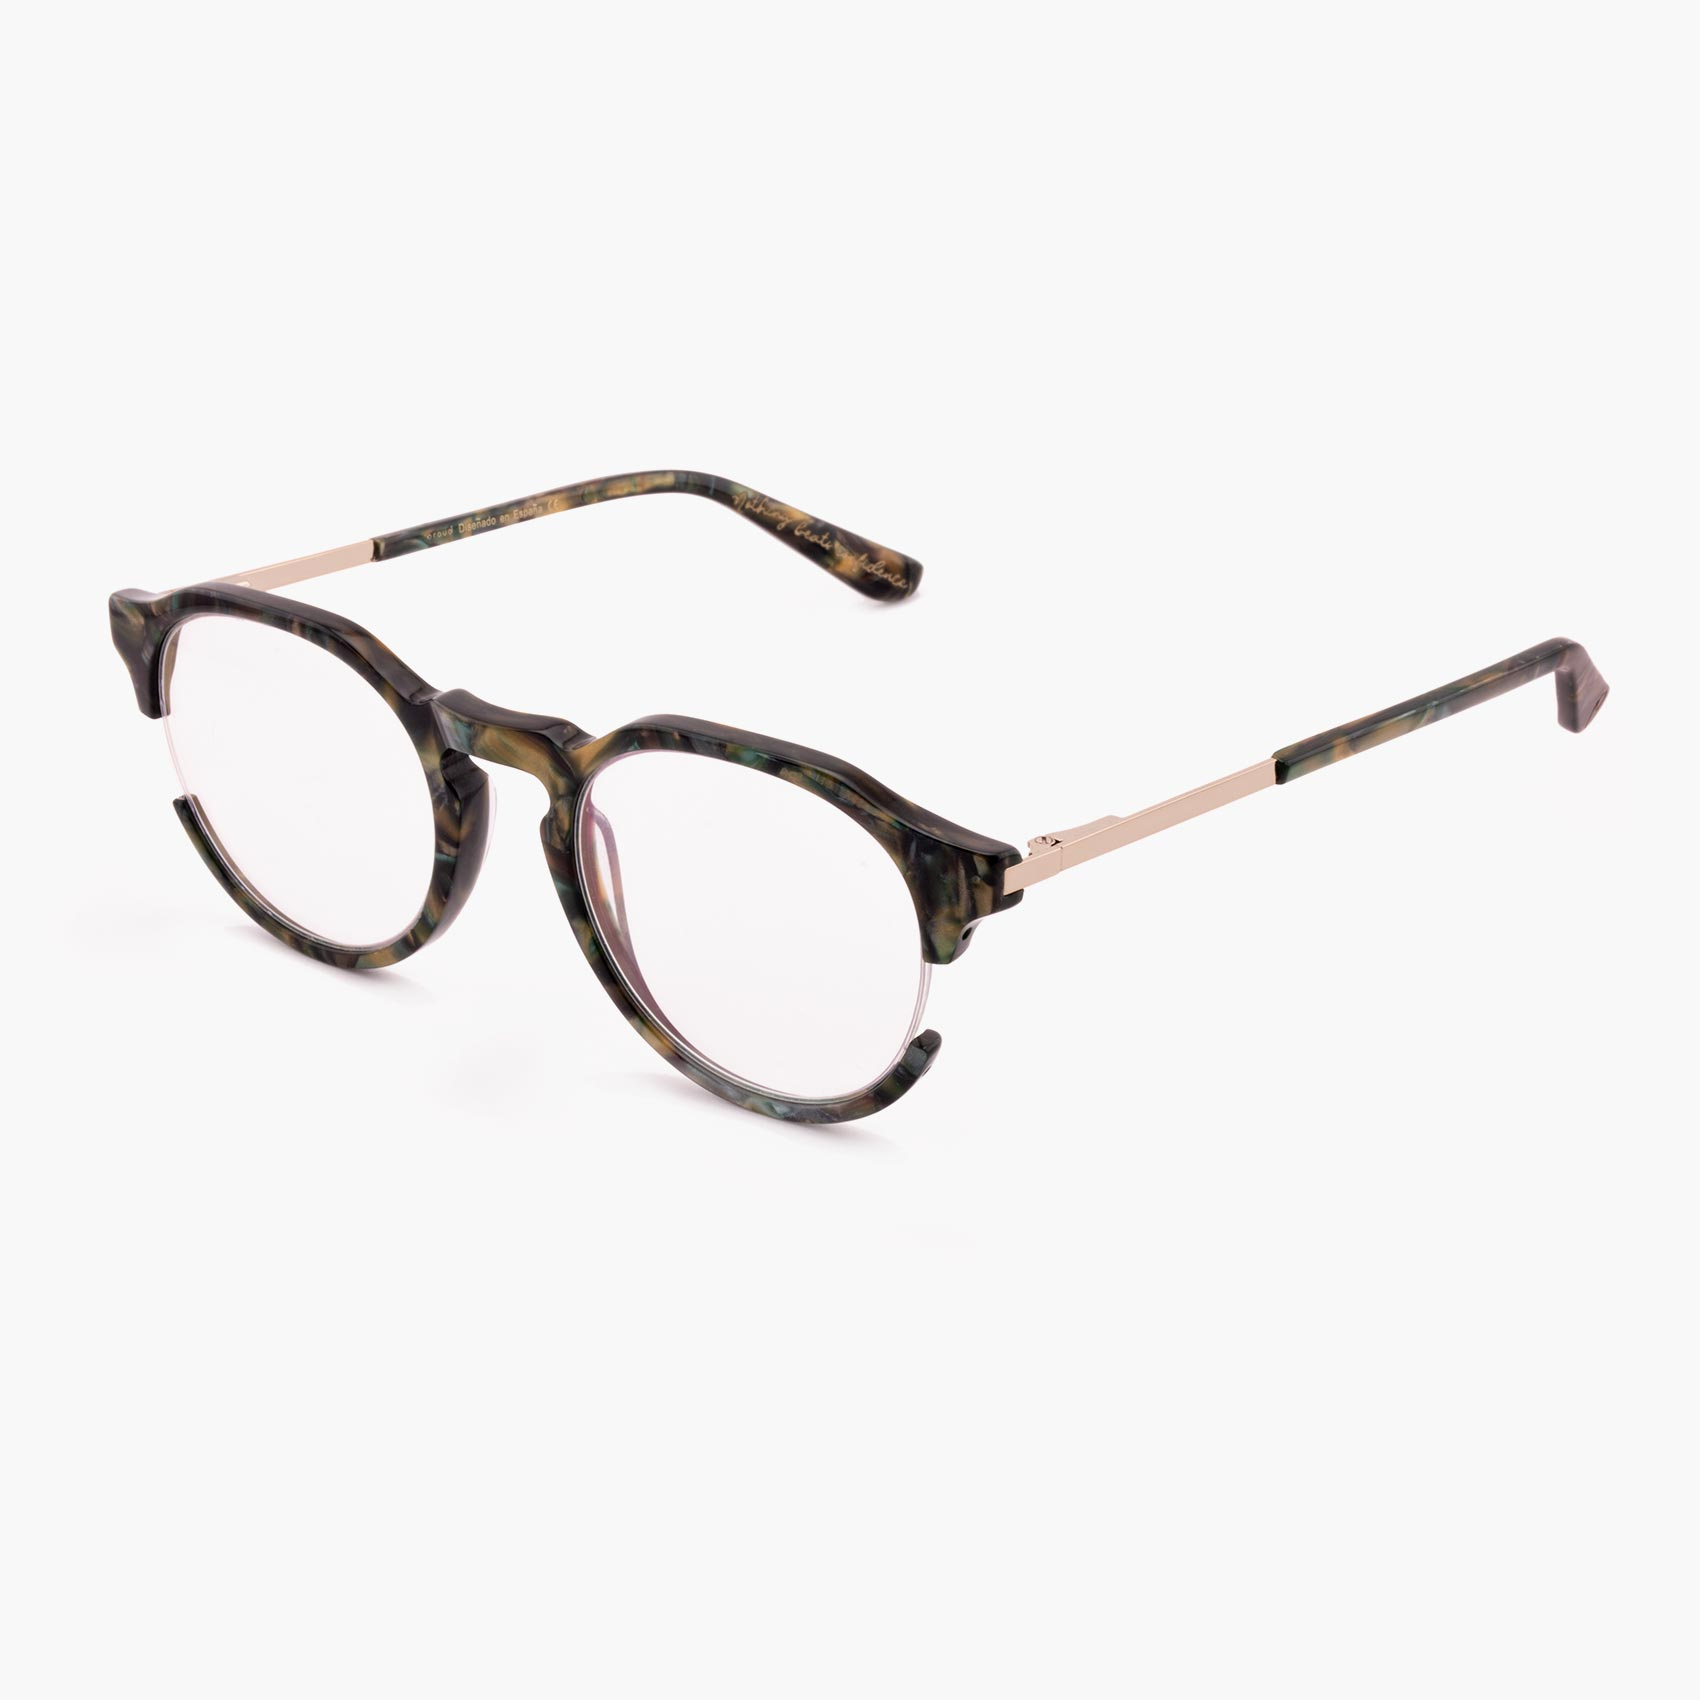 Proud eyewear Jodie C3 P gafas de vista mujer graduadas